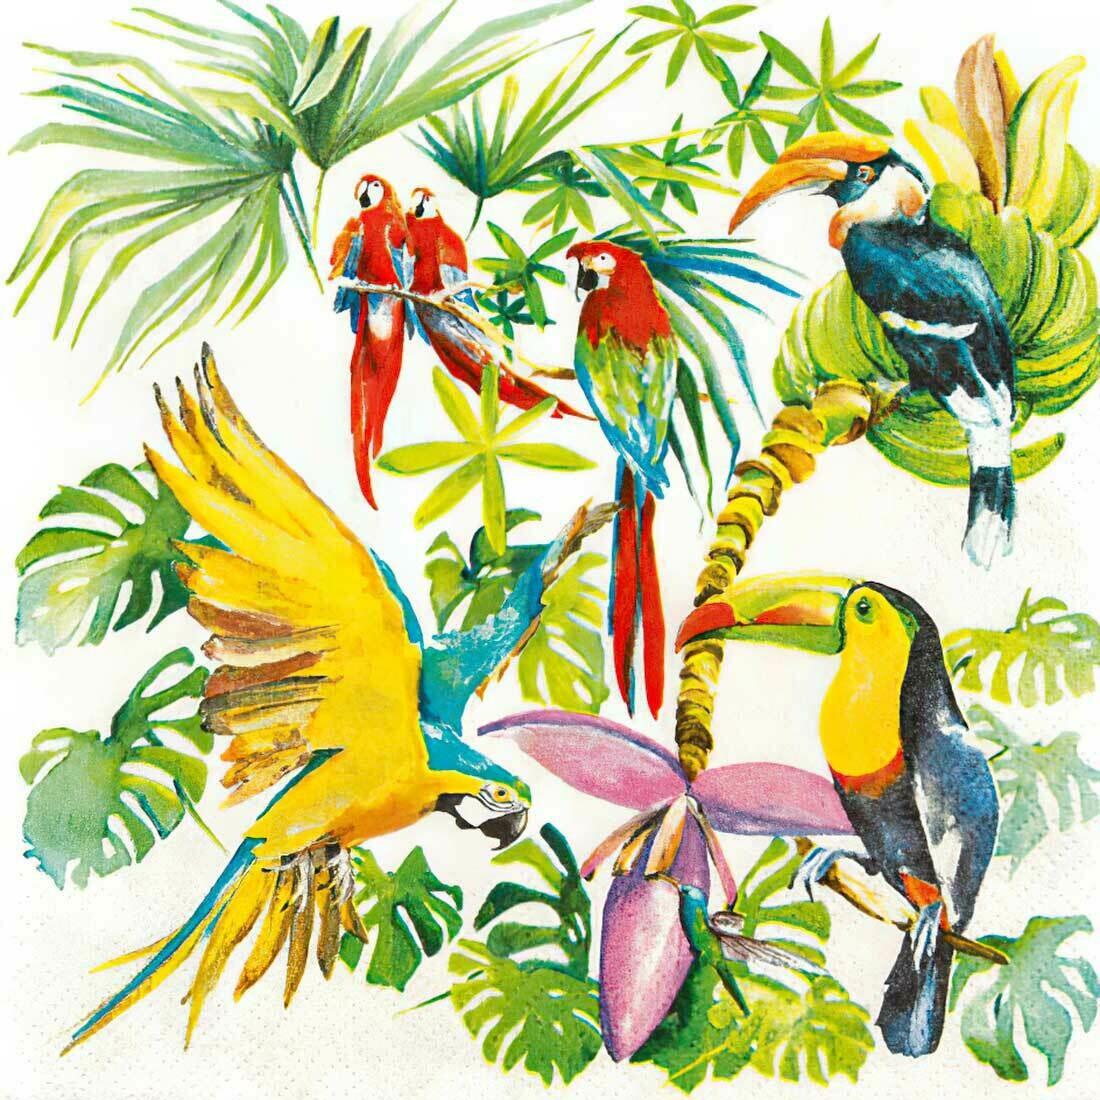 Decoupage Paper Napkins - Birds of Paradise (1 Sheet)